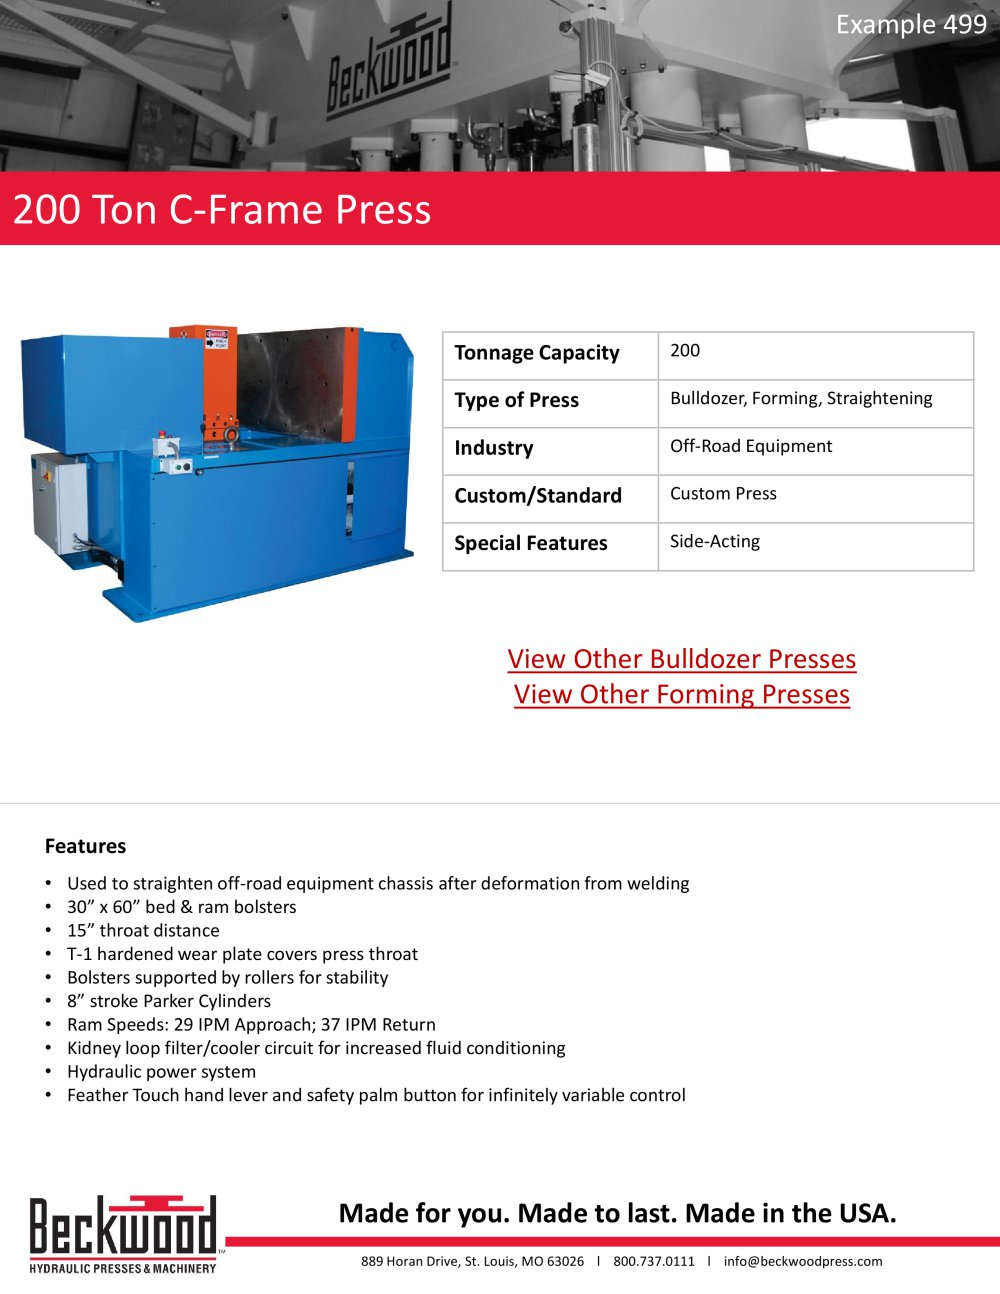 200 Ton C - Frame Press - Beckwood Press - PDF Catalogue | Technical ...